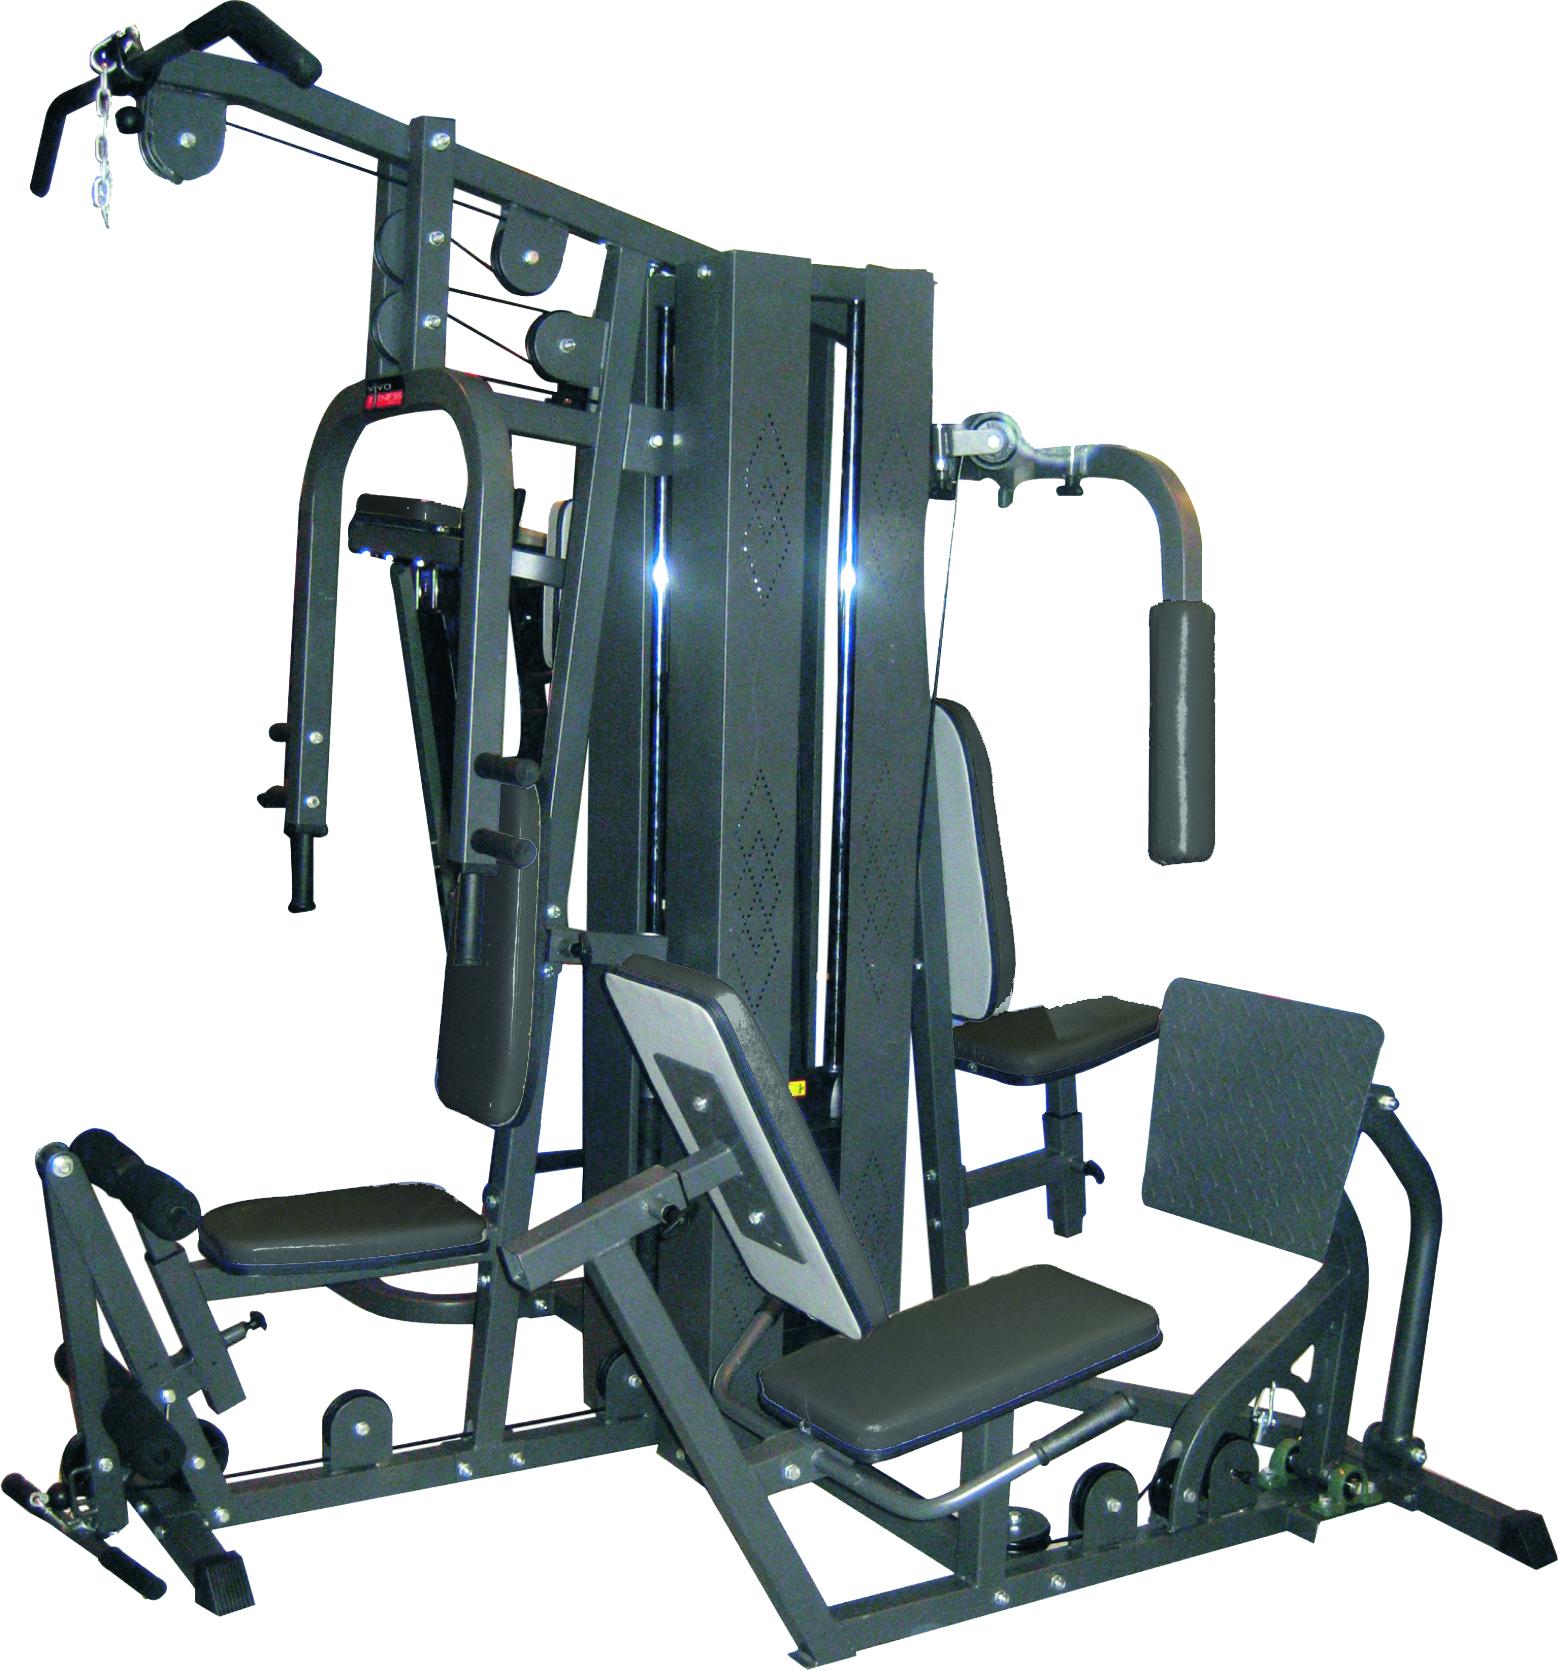 518BI KARIZMA Commercial Multi Gym